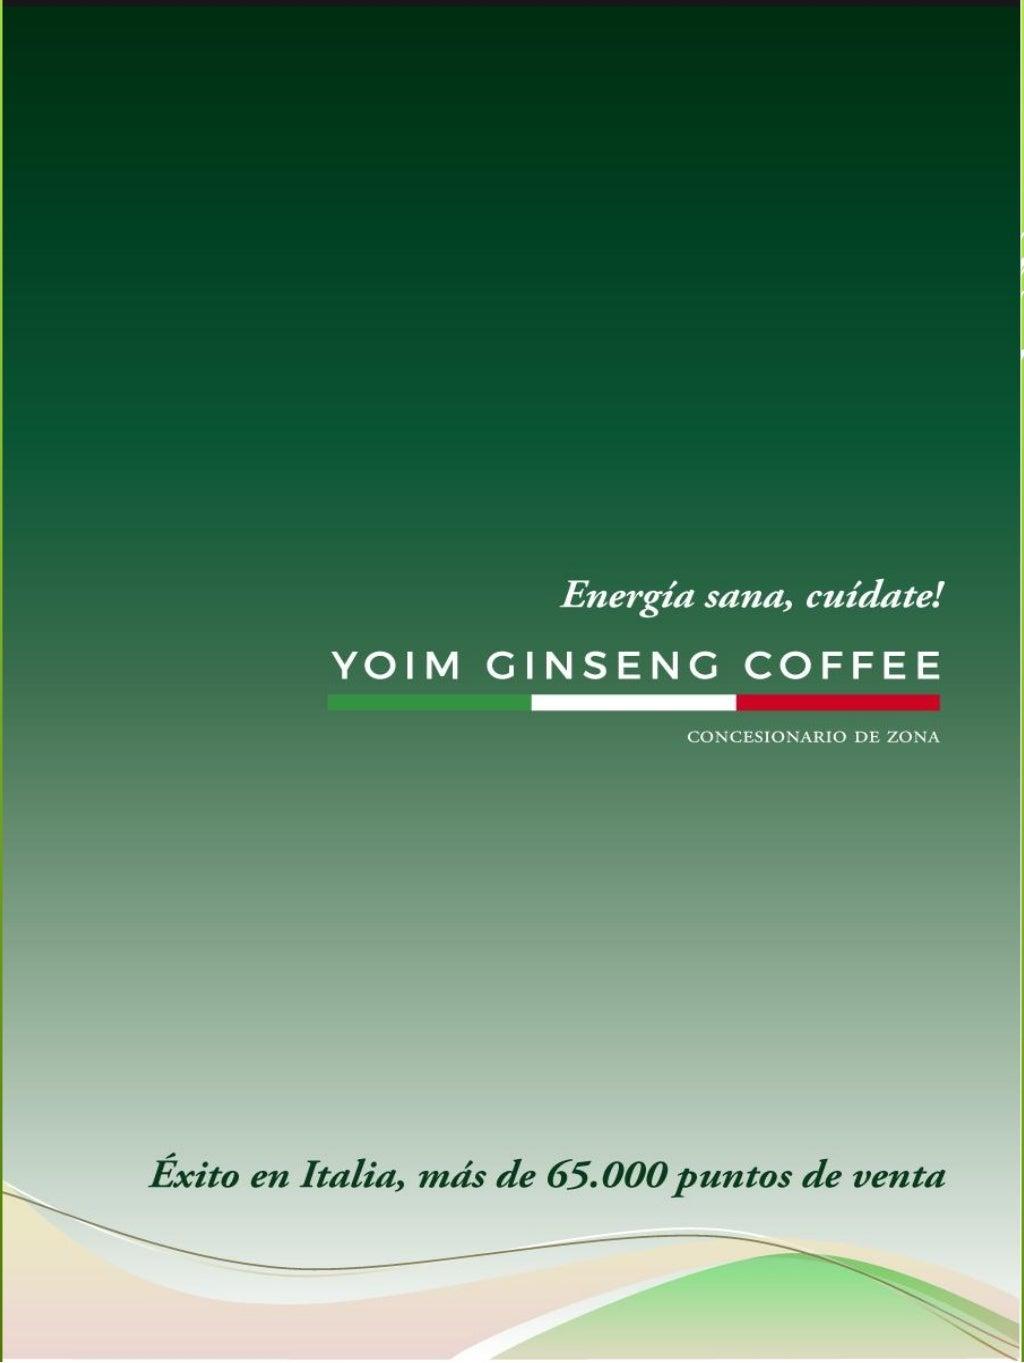 Presentación www.yoimginsengcoffee.com